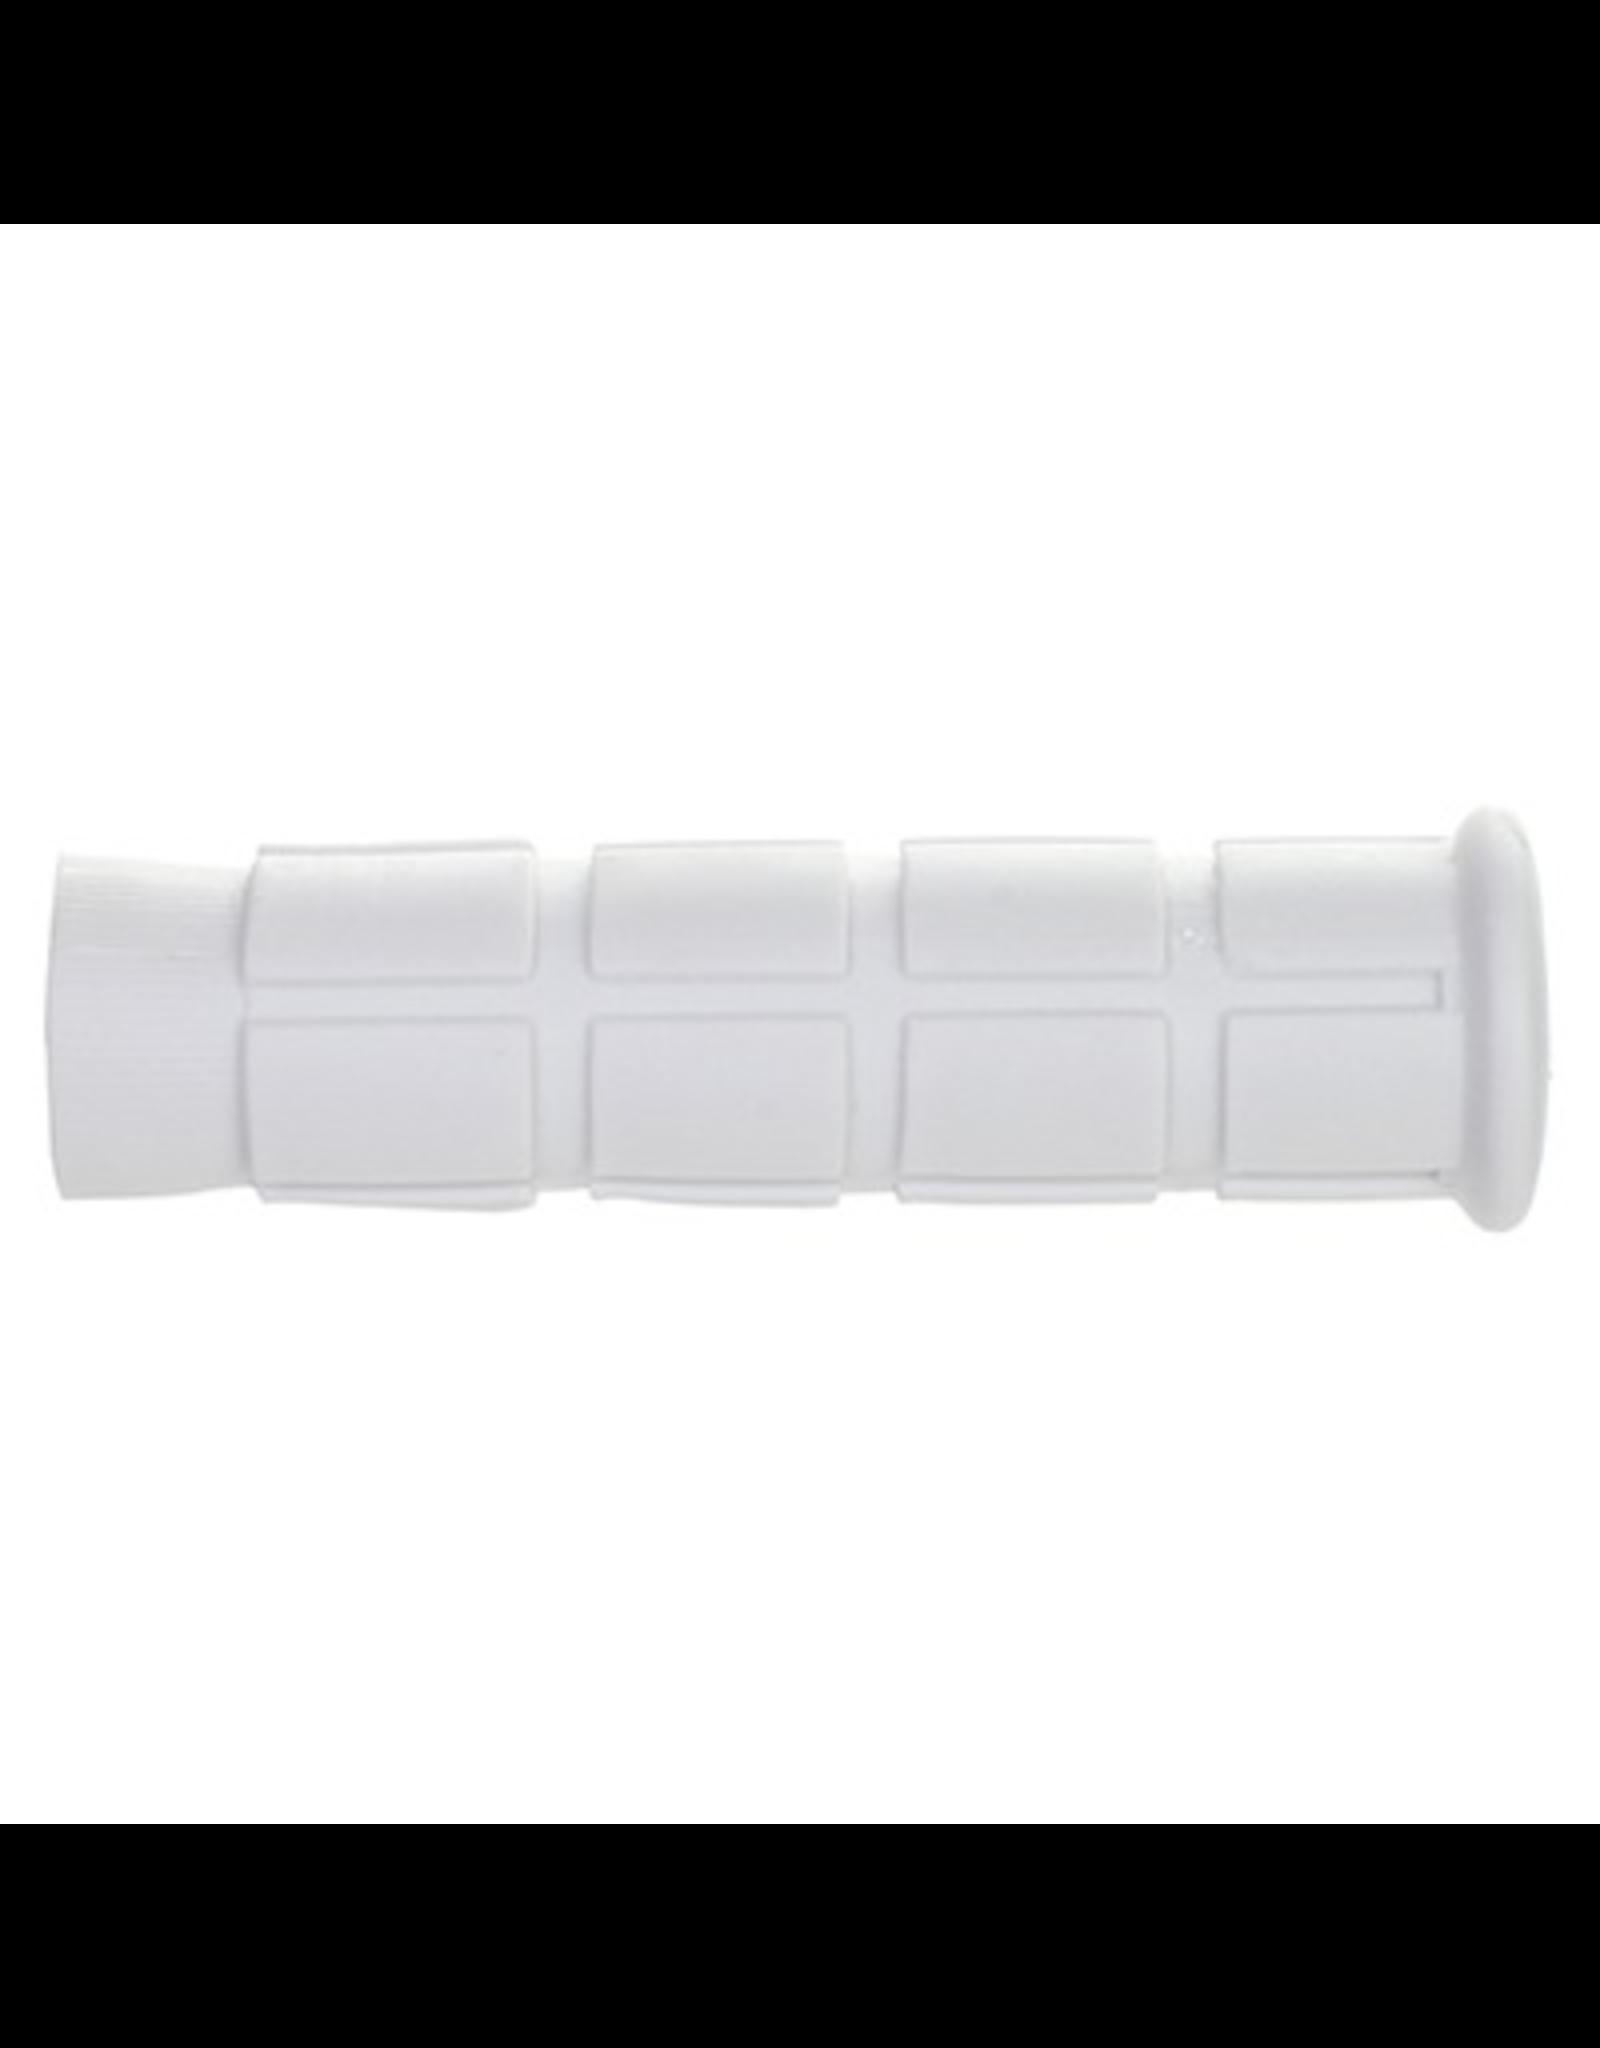 Sunlite Classic Mountain Grips - White